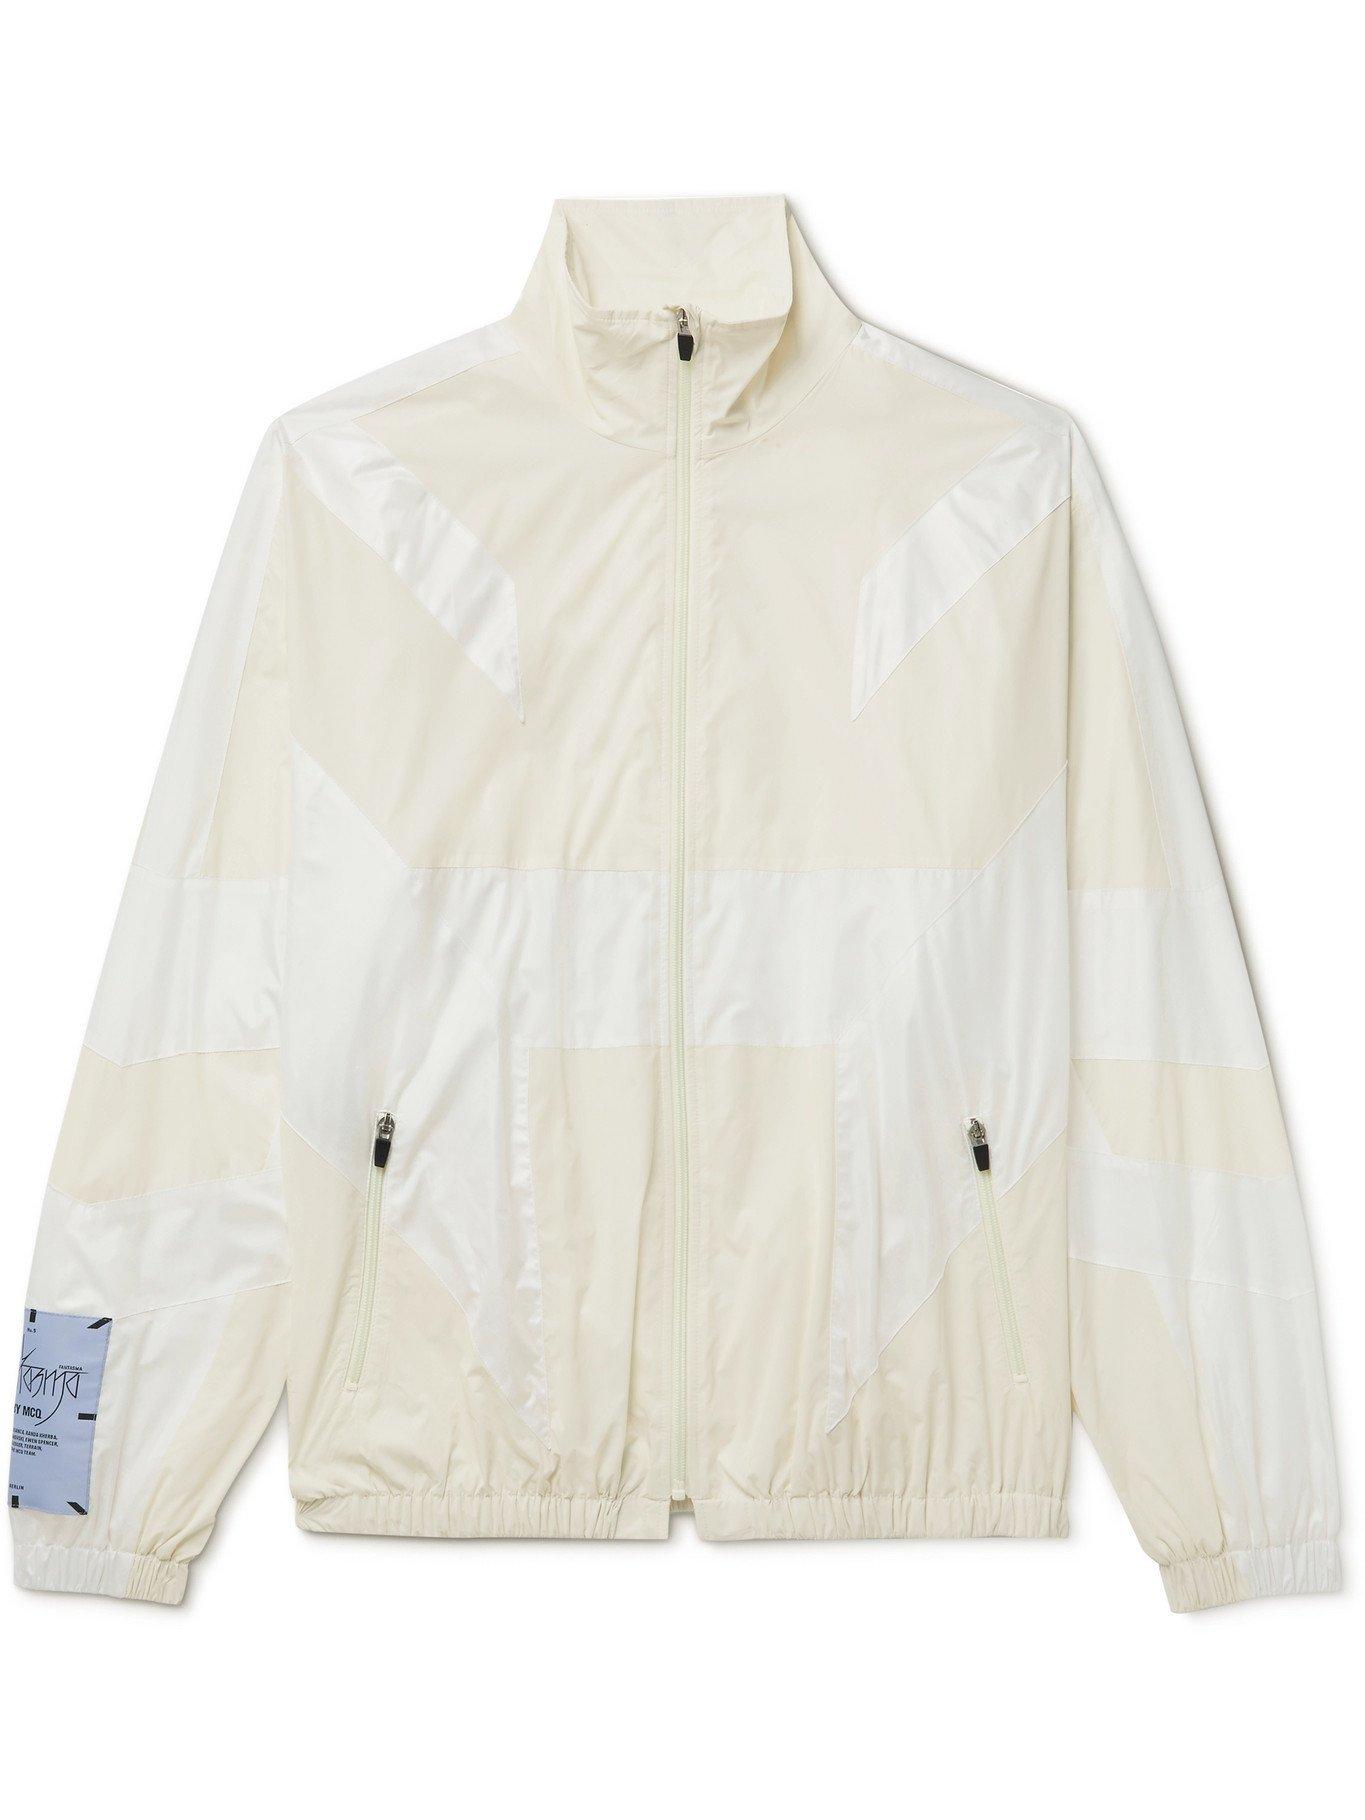 MCQ - Fantasma Glow-in-the-Dark Panelled Shell Jacket - White - M